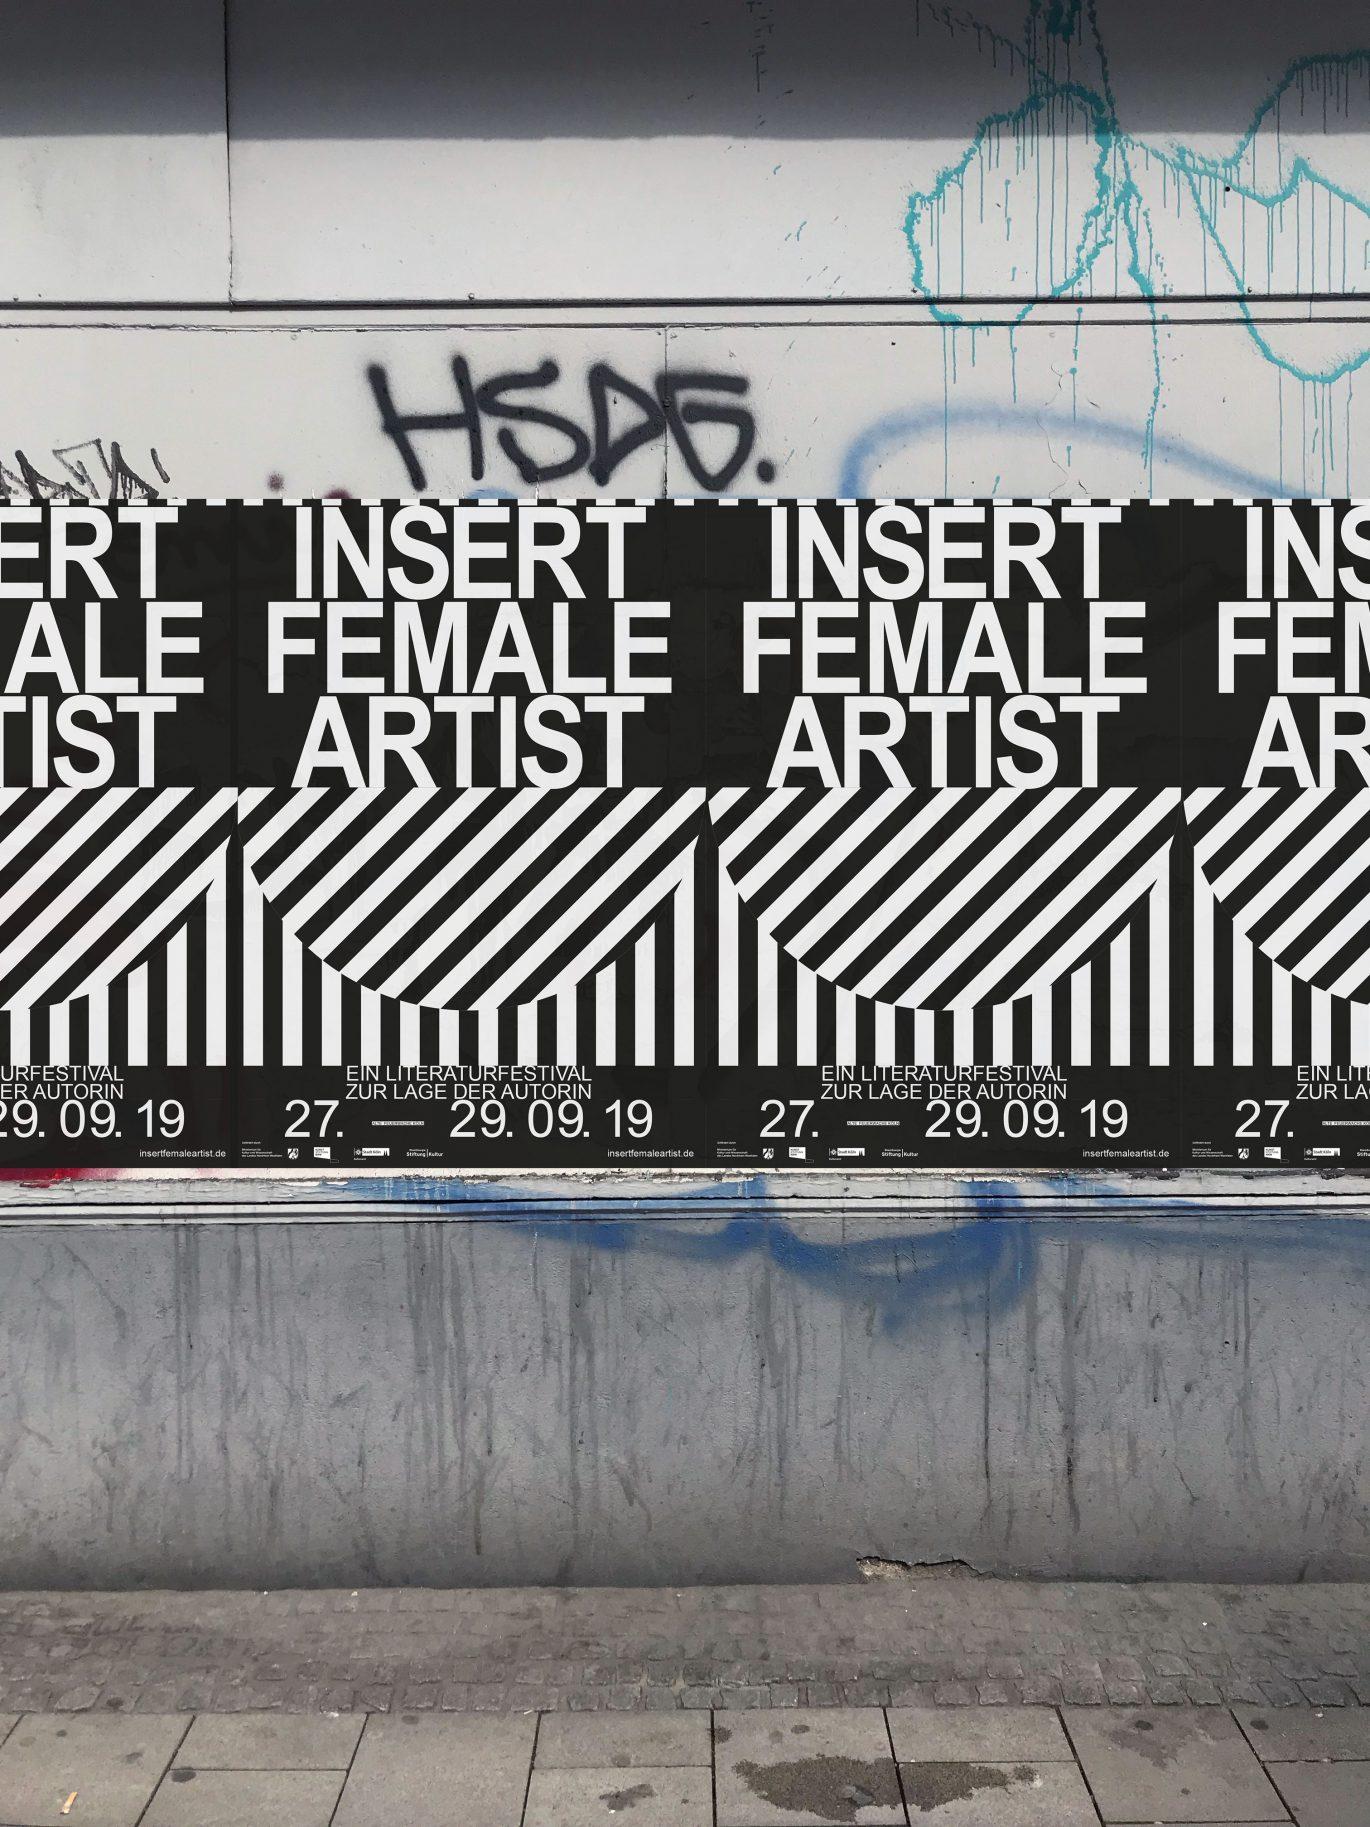 Poster |Raport | City | Anwendung | Festival